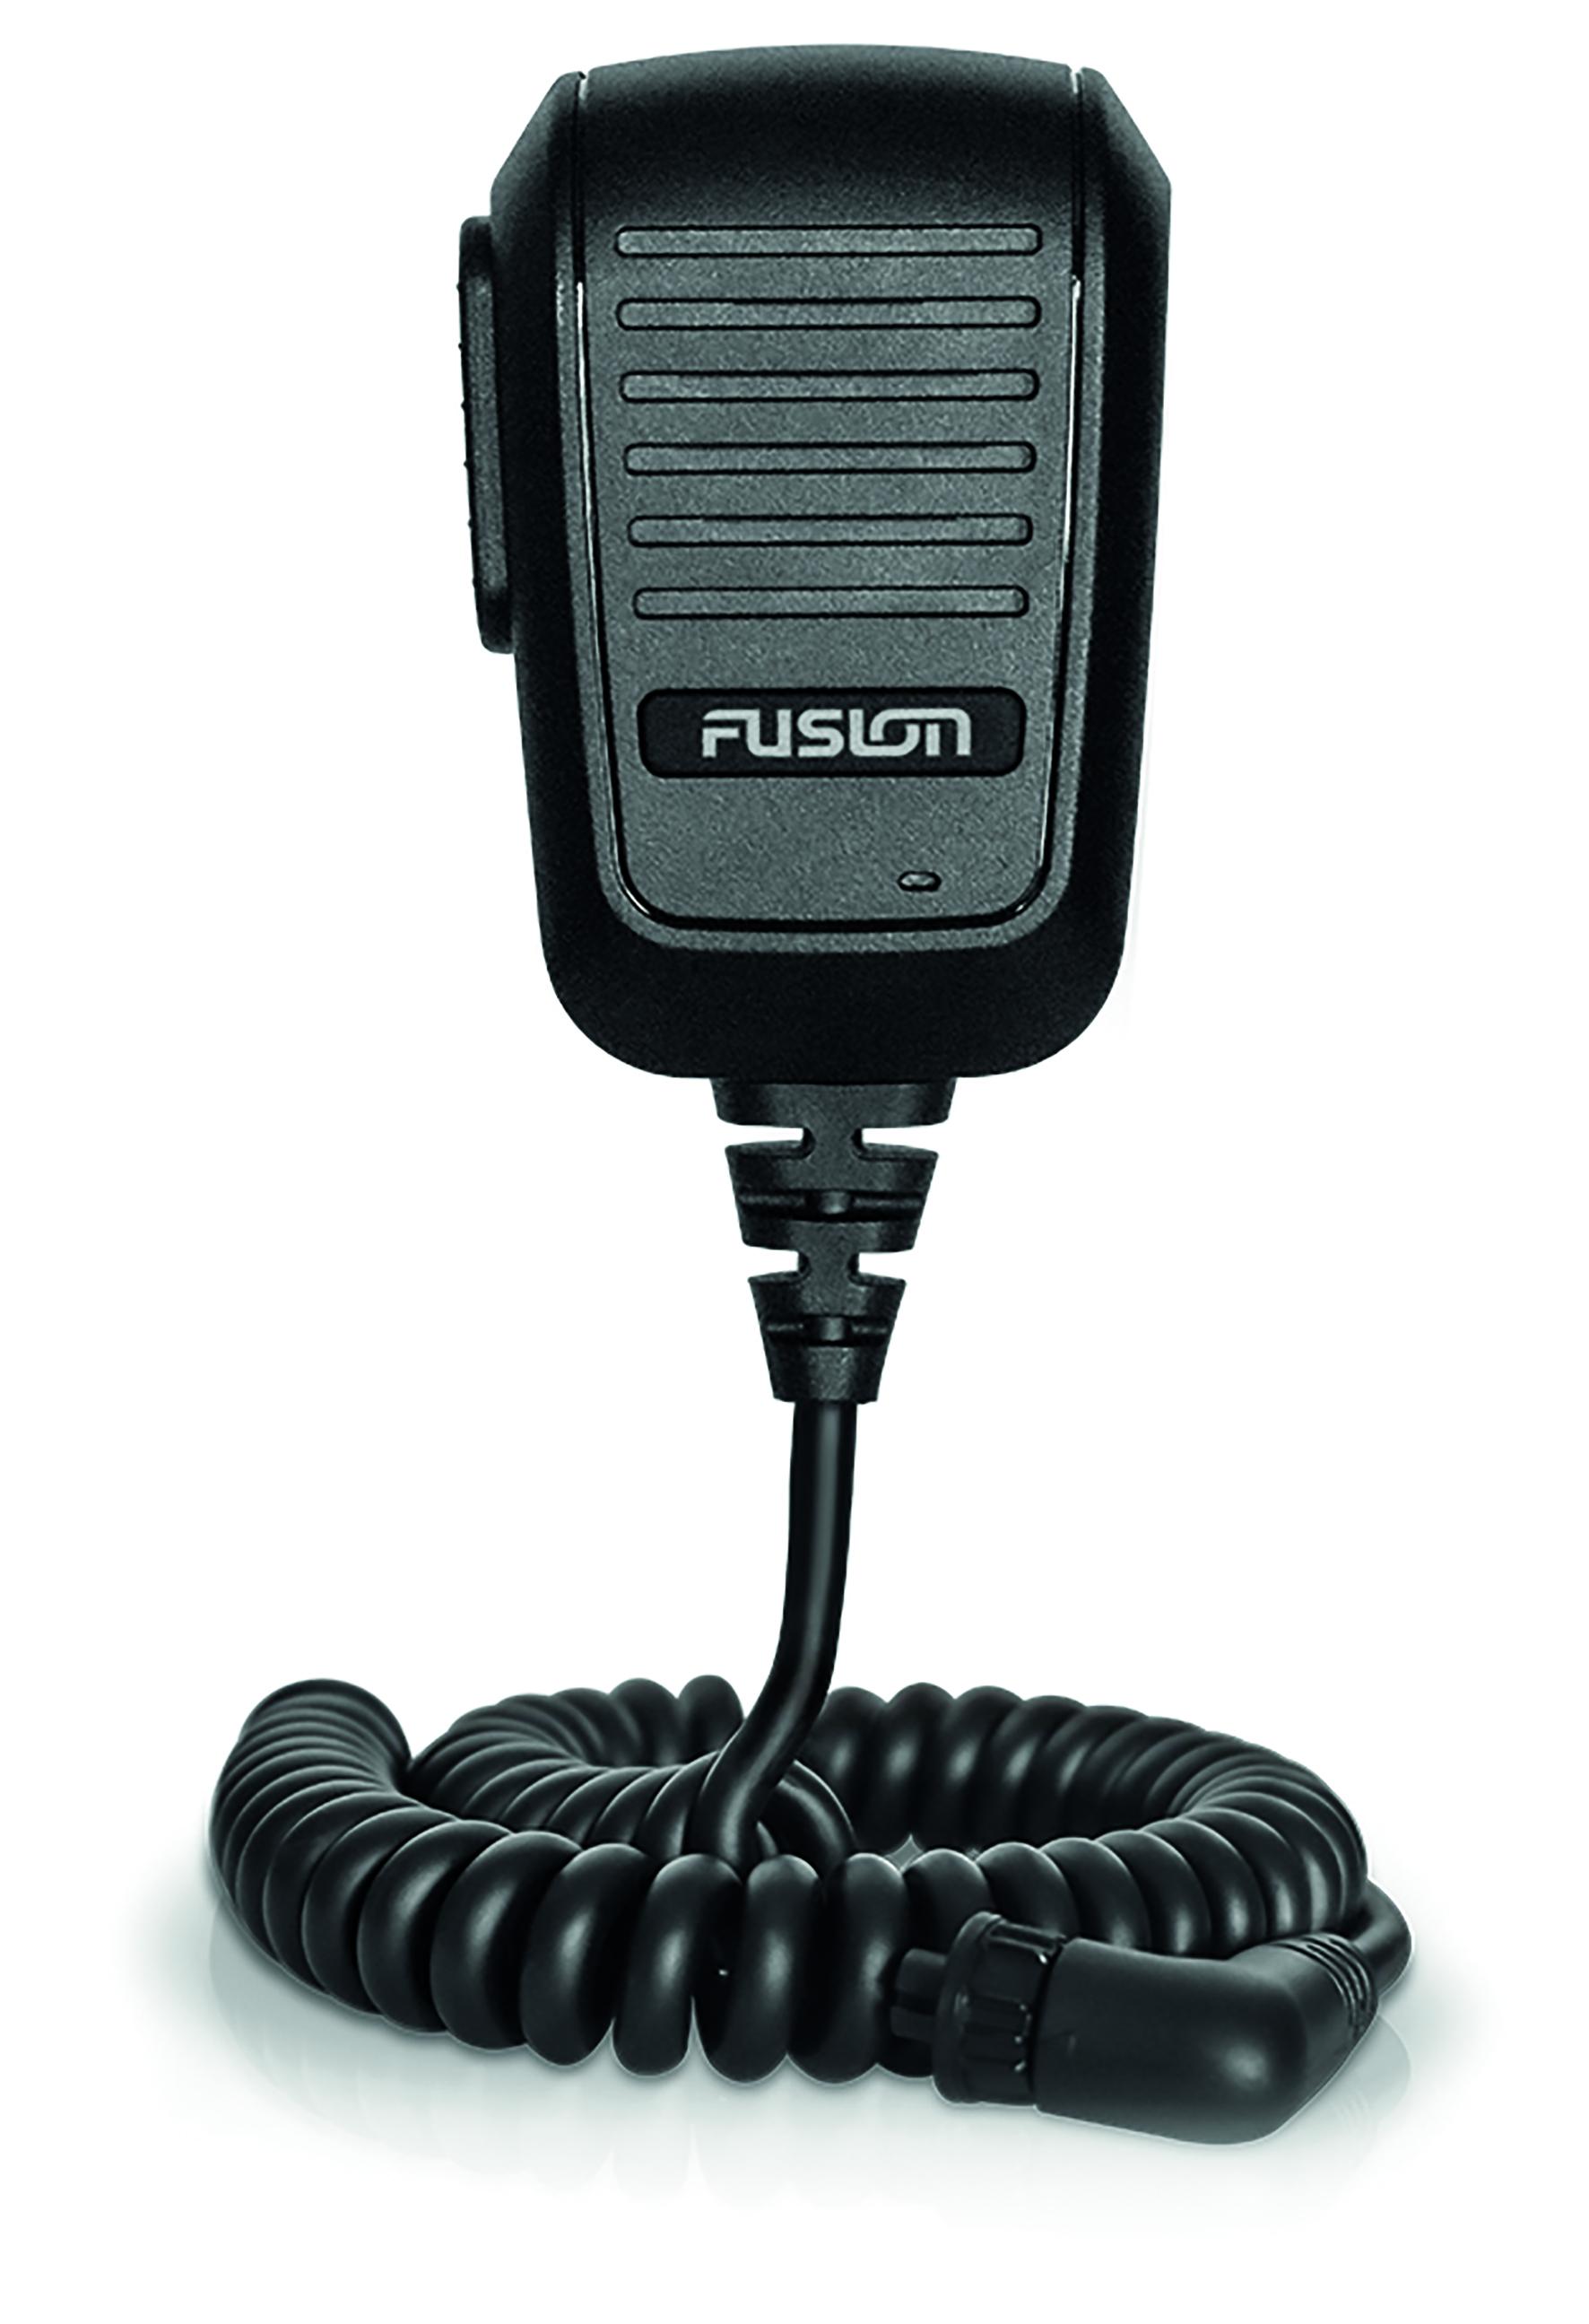 Fusion marine Handmikrofon MS-FHM